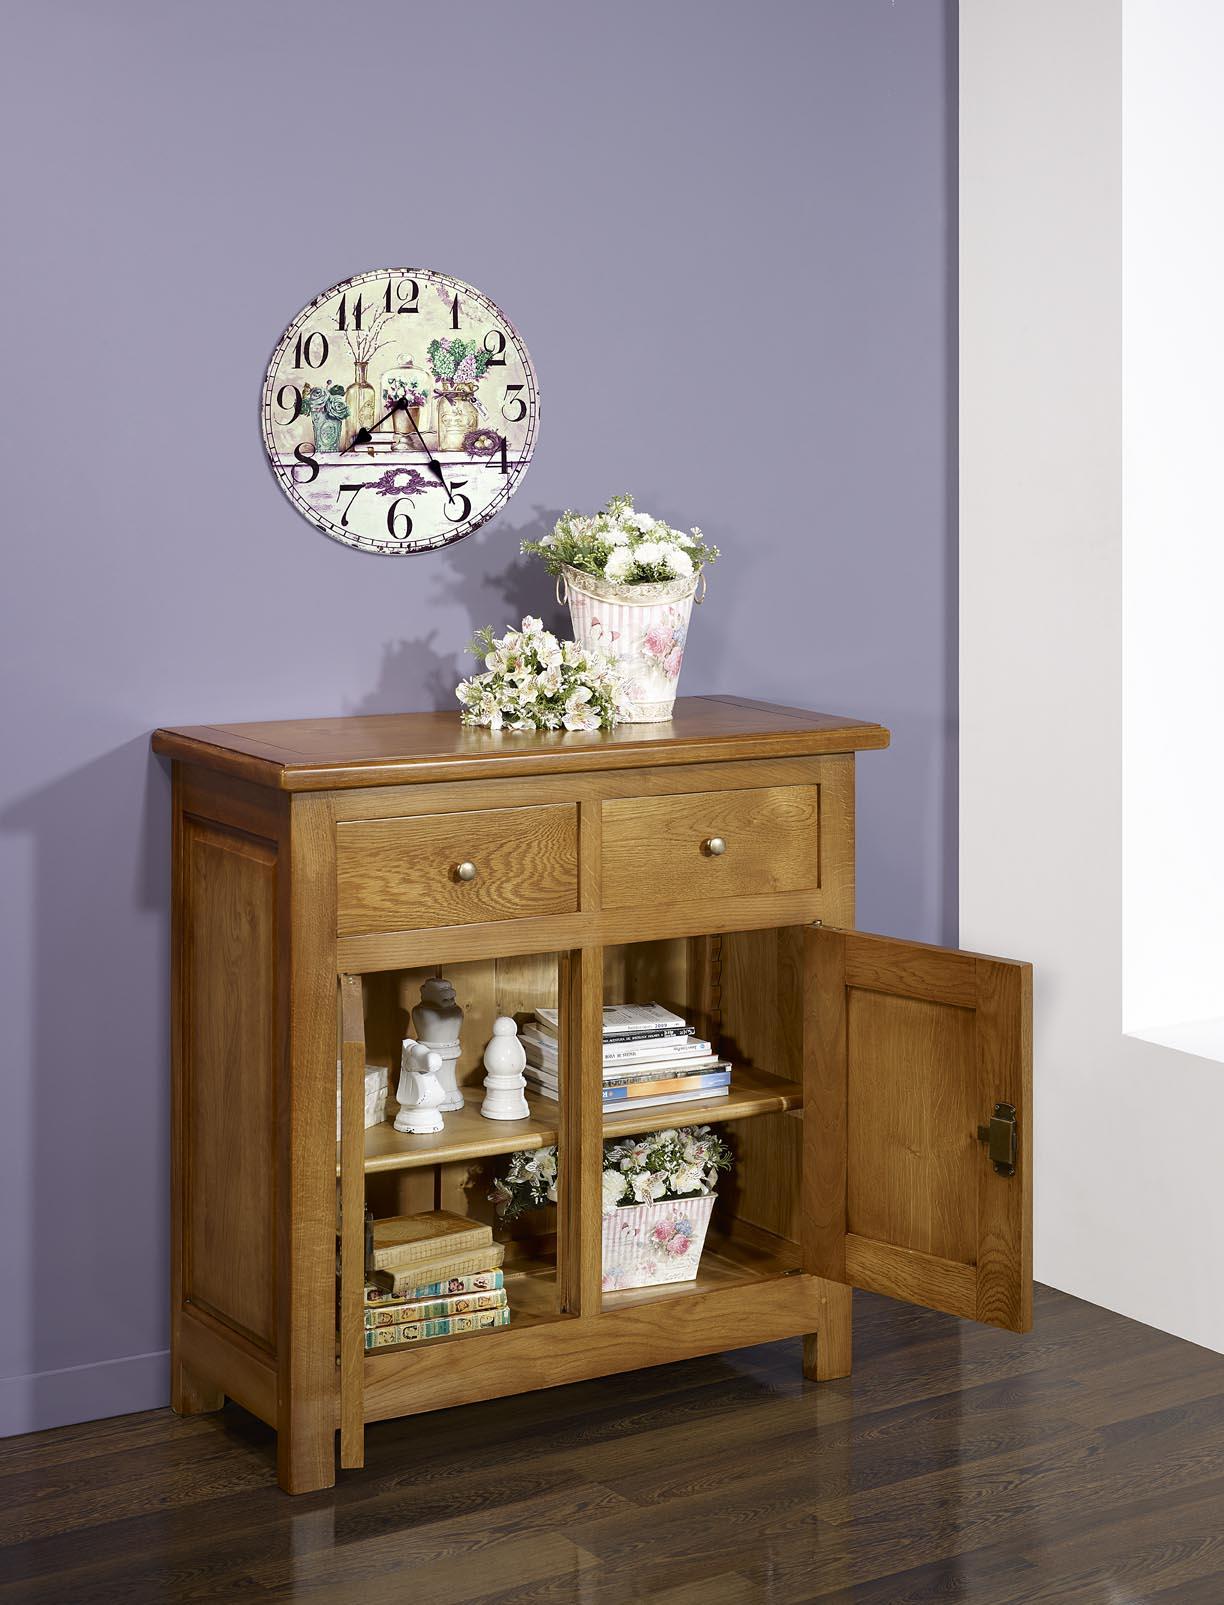 petit buffet 2 portes 2 tiroirs en ch ne massif de style campagnard meuble en ch ne massif. Black Bedroom Furniture Sets. Home Design Ideas